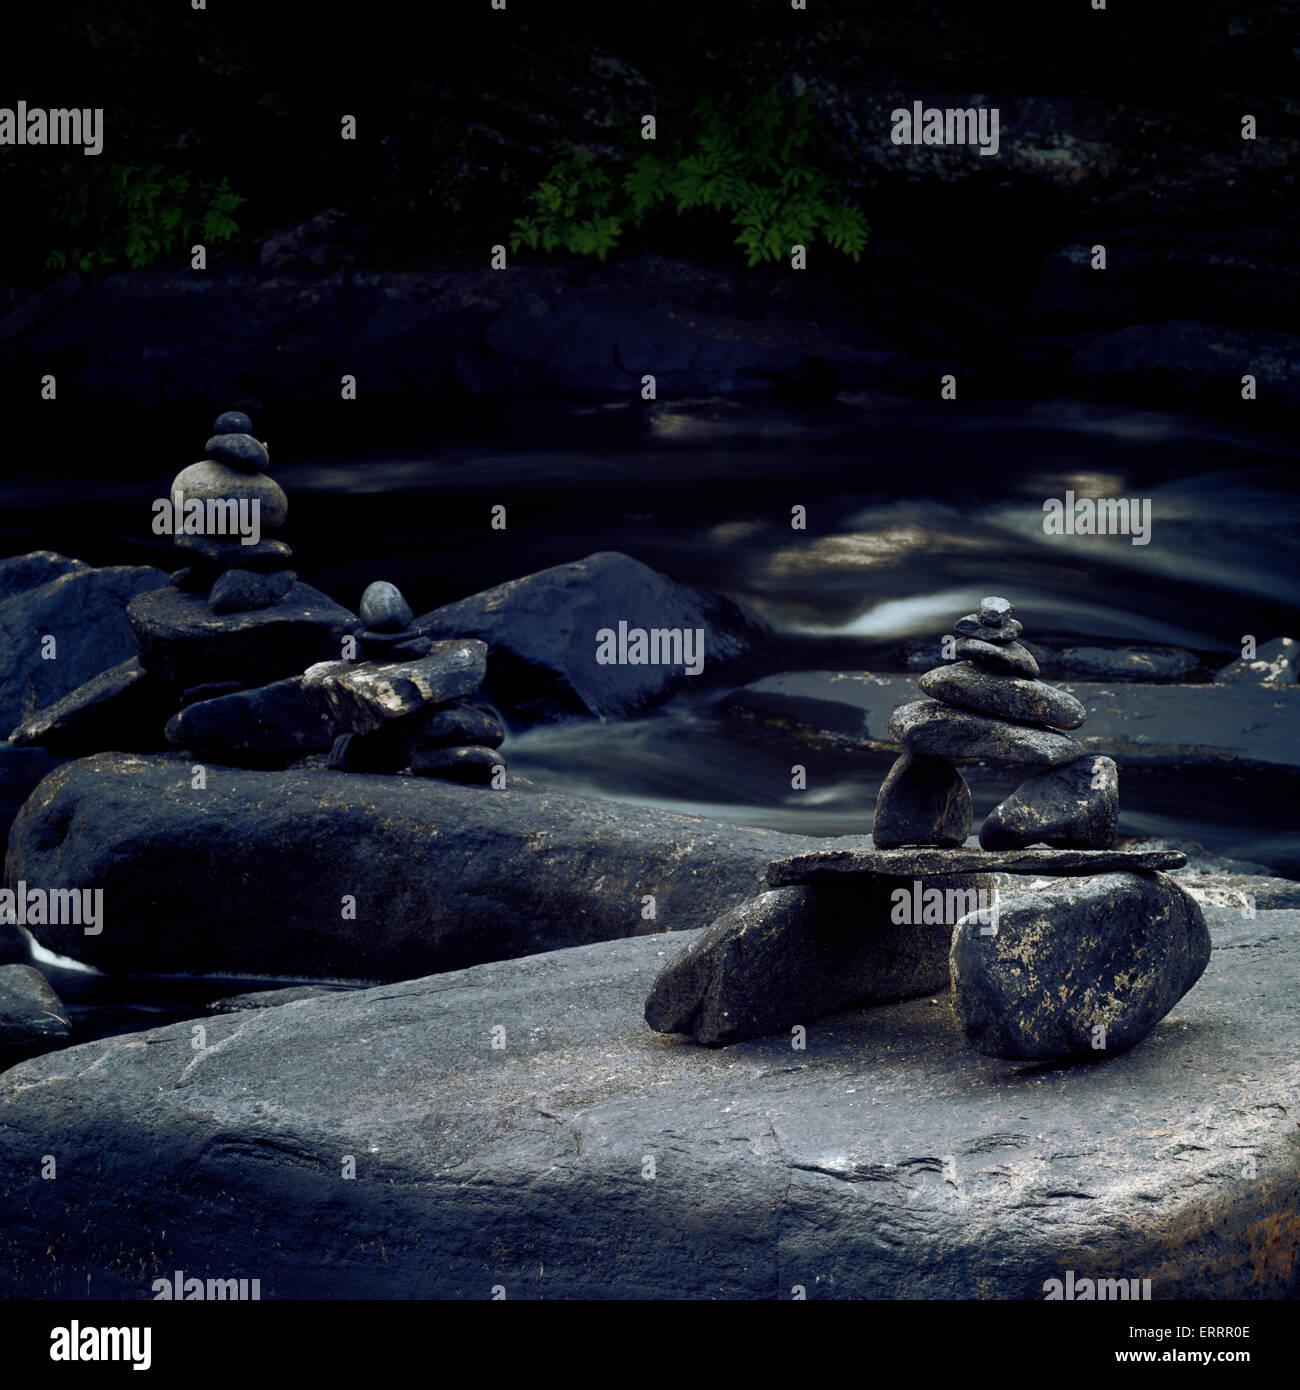 Inuksuk stone figures surrounded by river rapids in Muskoka, Ontario, Canada. - Stock Image